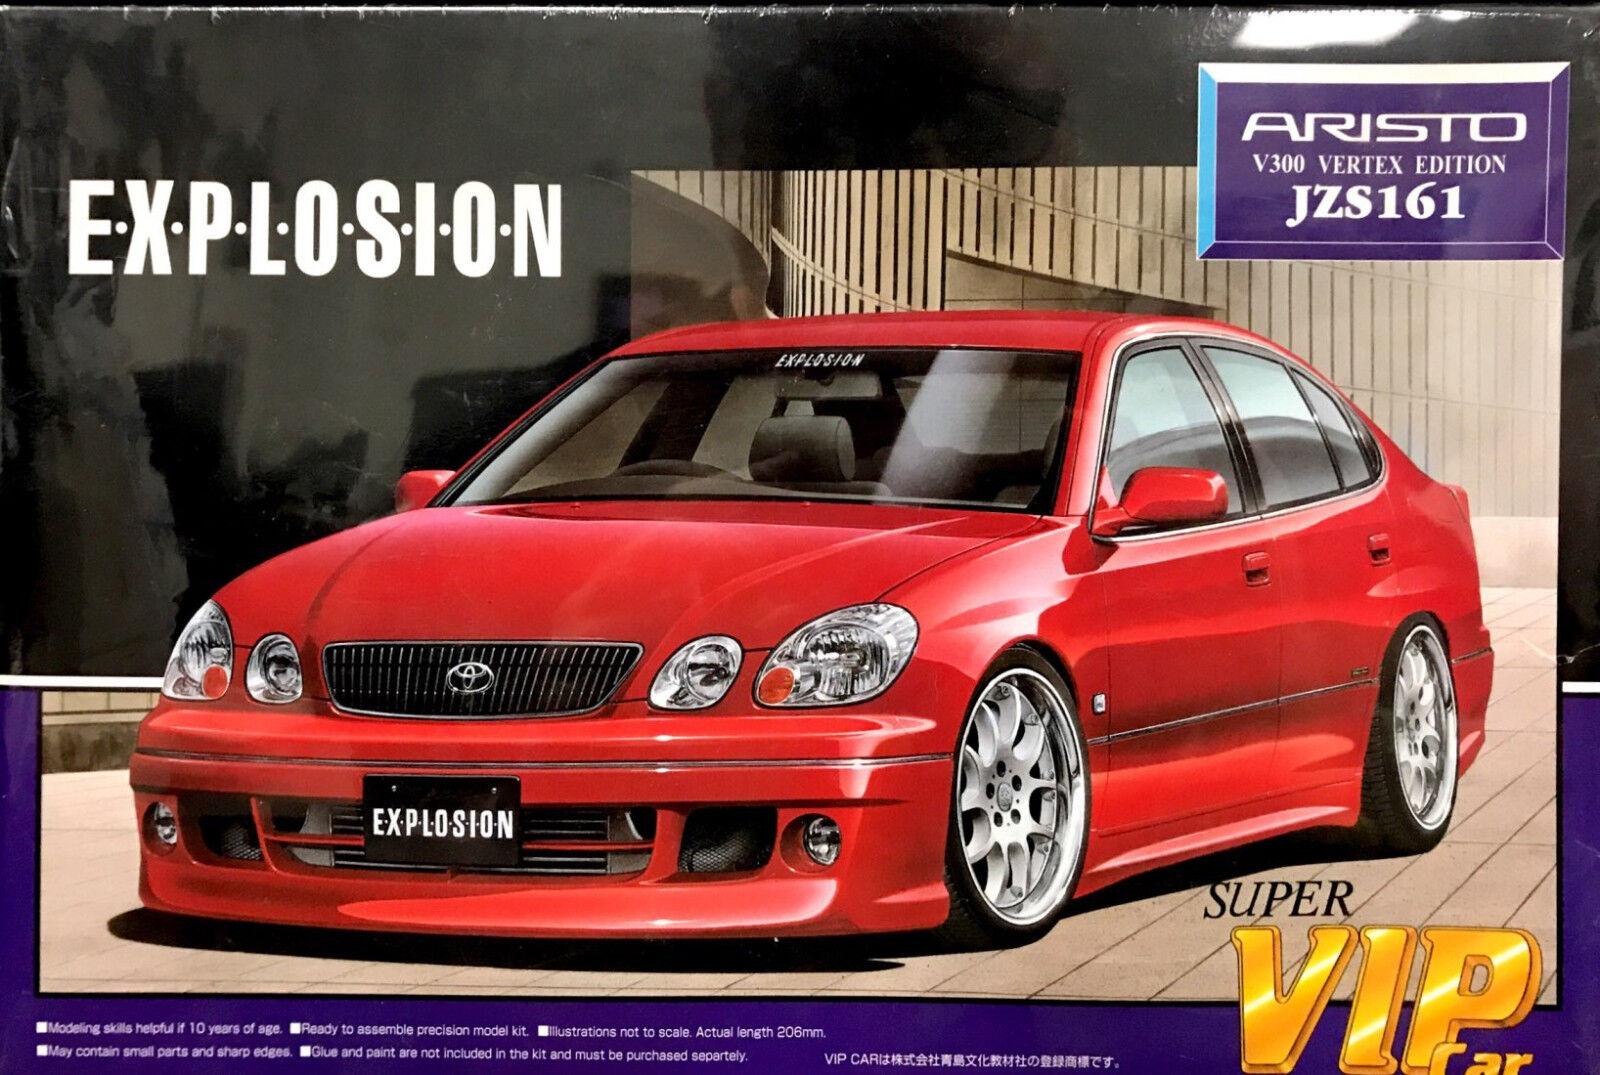 Aoshima 1 24 Aristo V300 greenex Edition JZS161 Super VIP Car Model Kit 024669